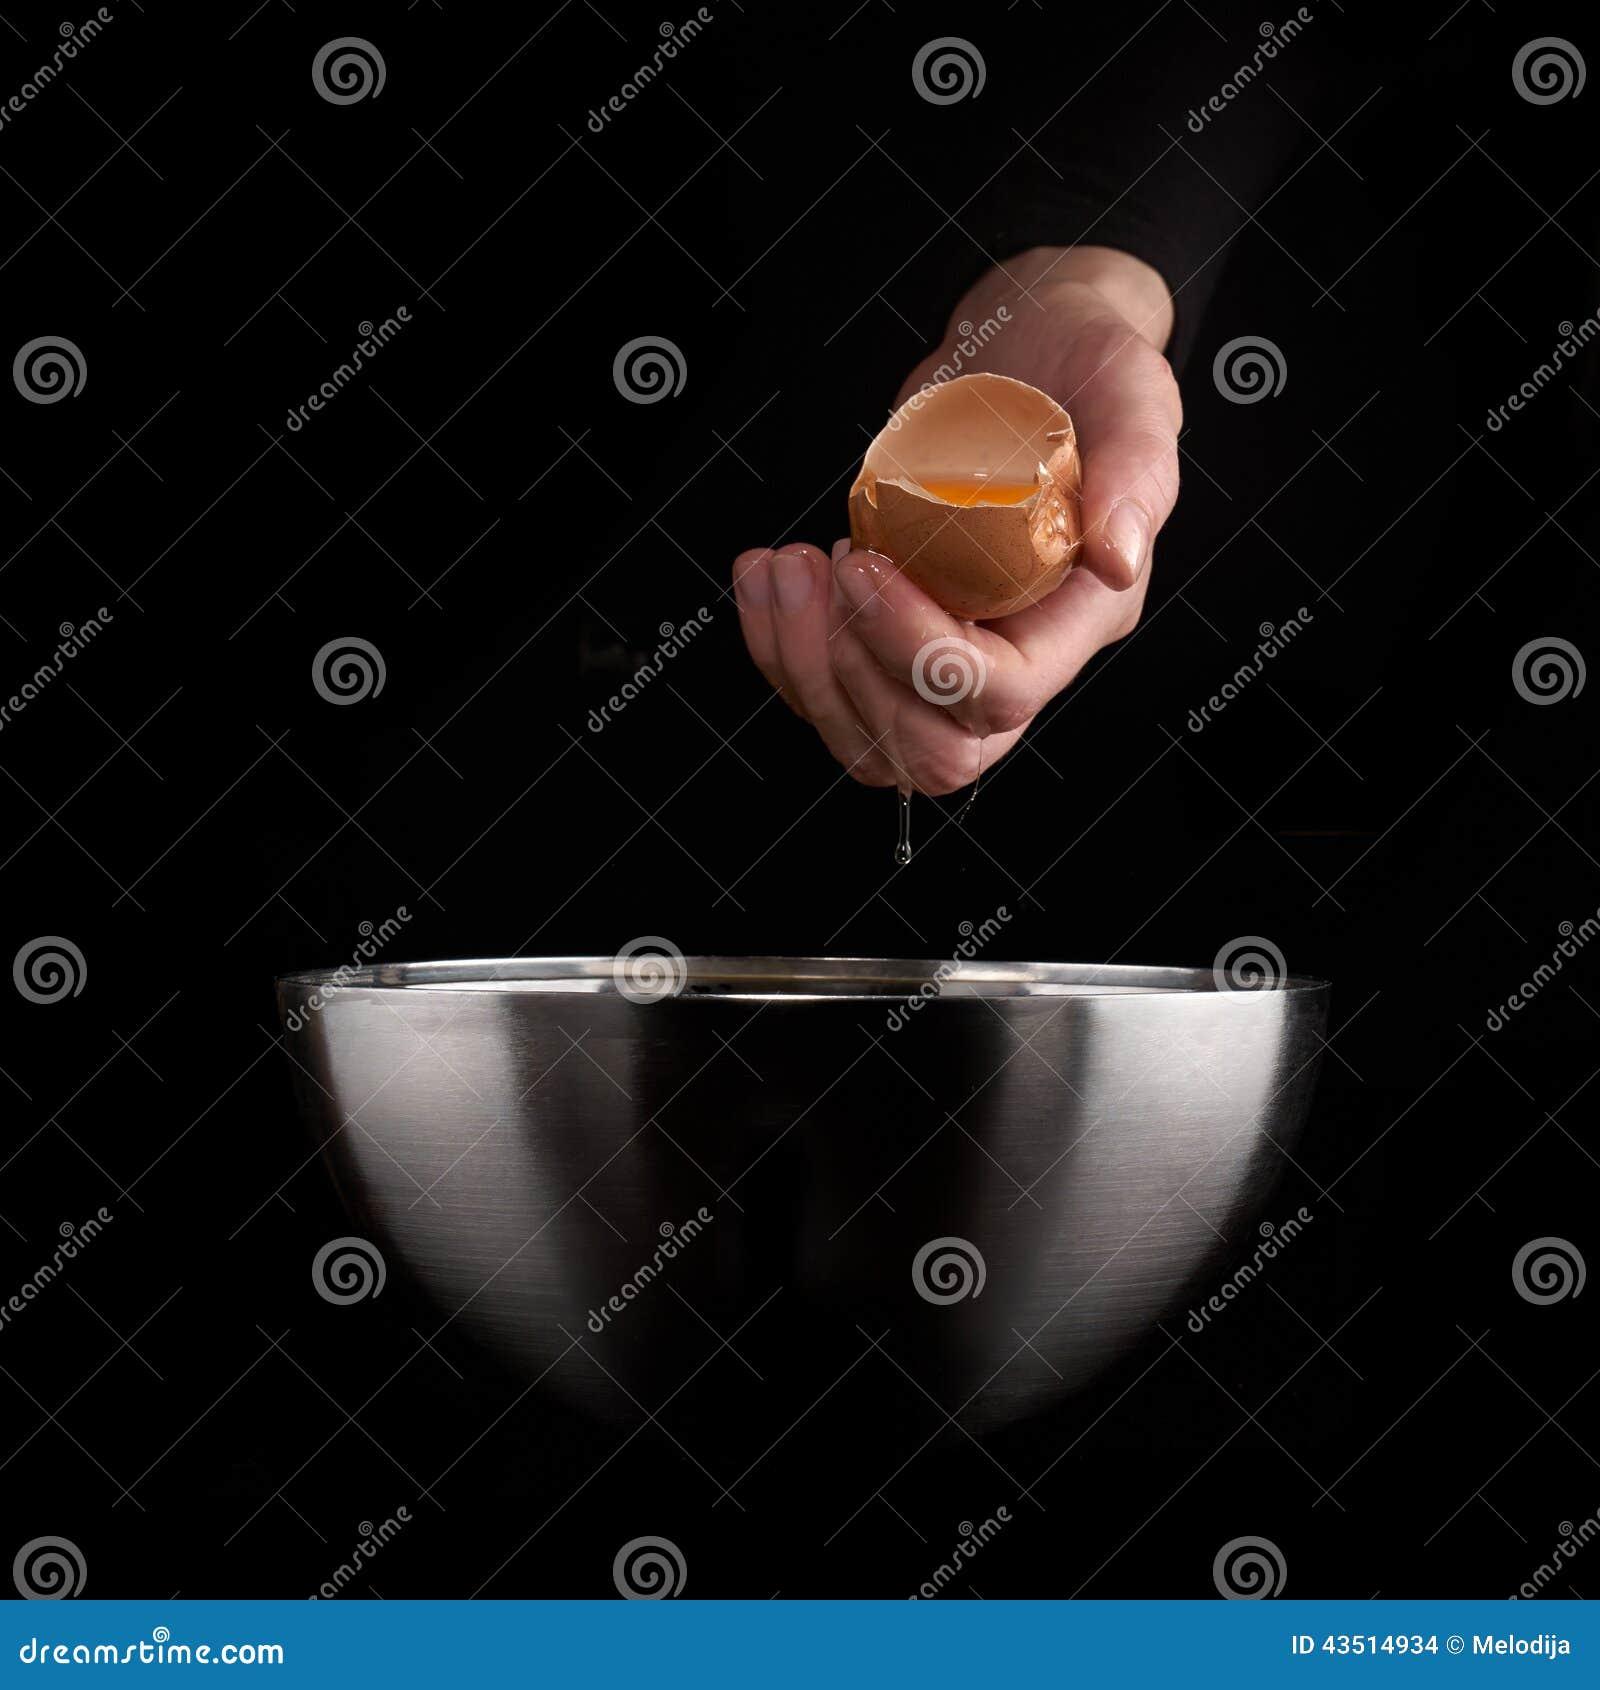 egg yolk falling - photo #25